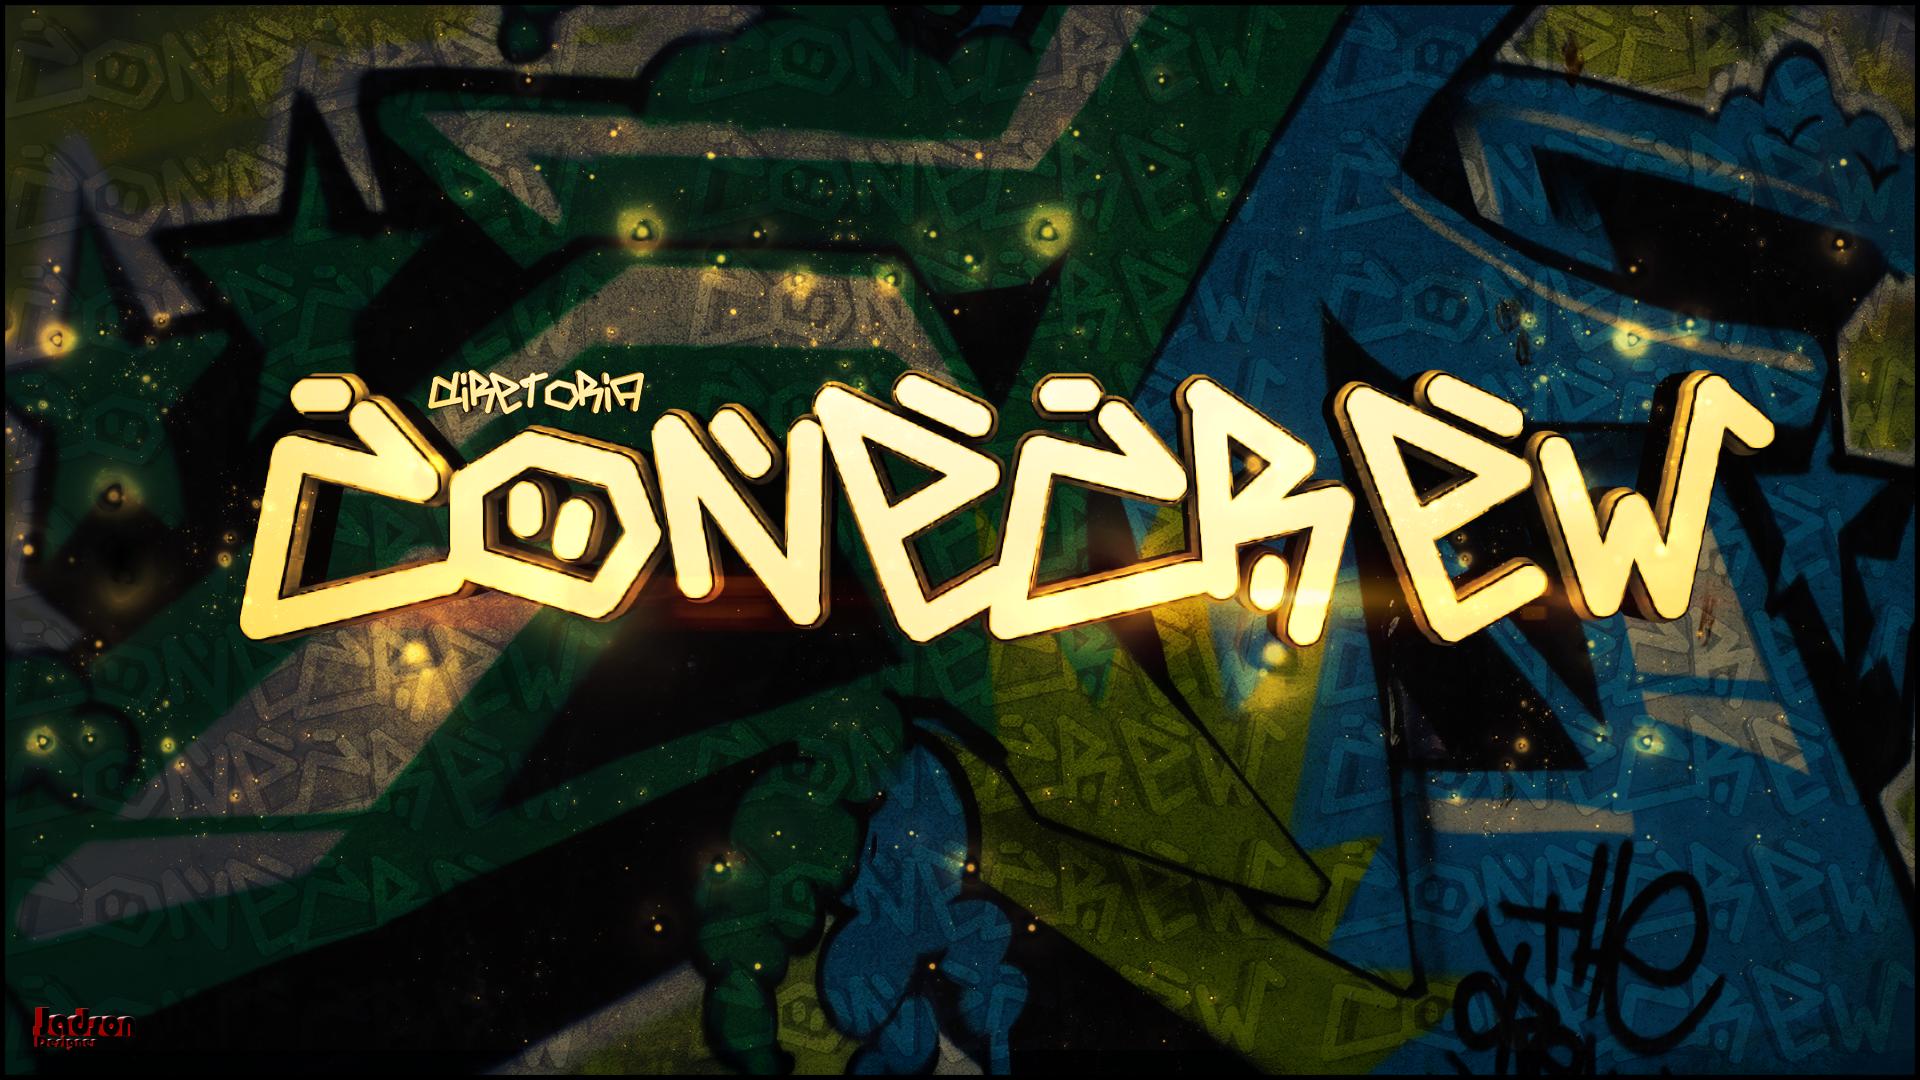 Cone Crew Diretoria Wallpaper By JadsonWYW